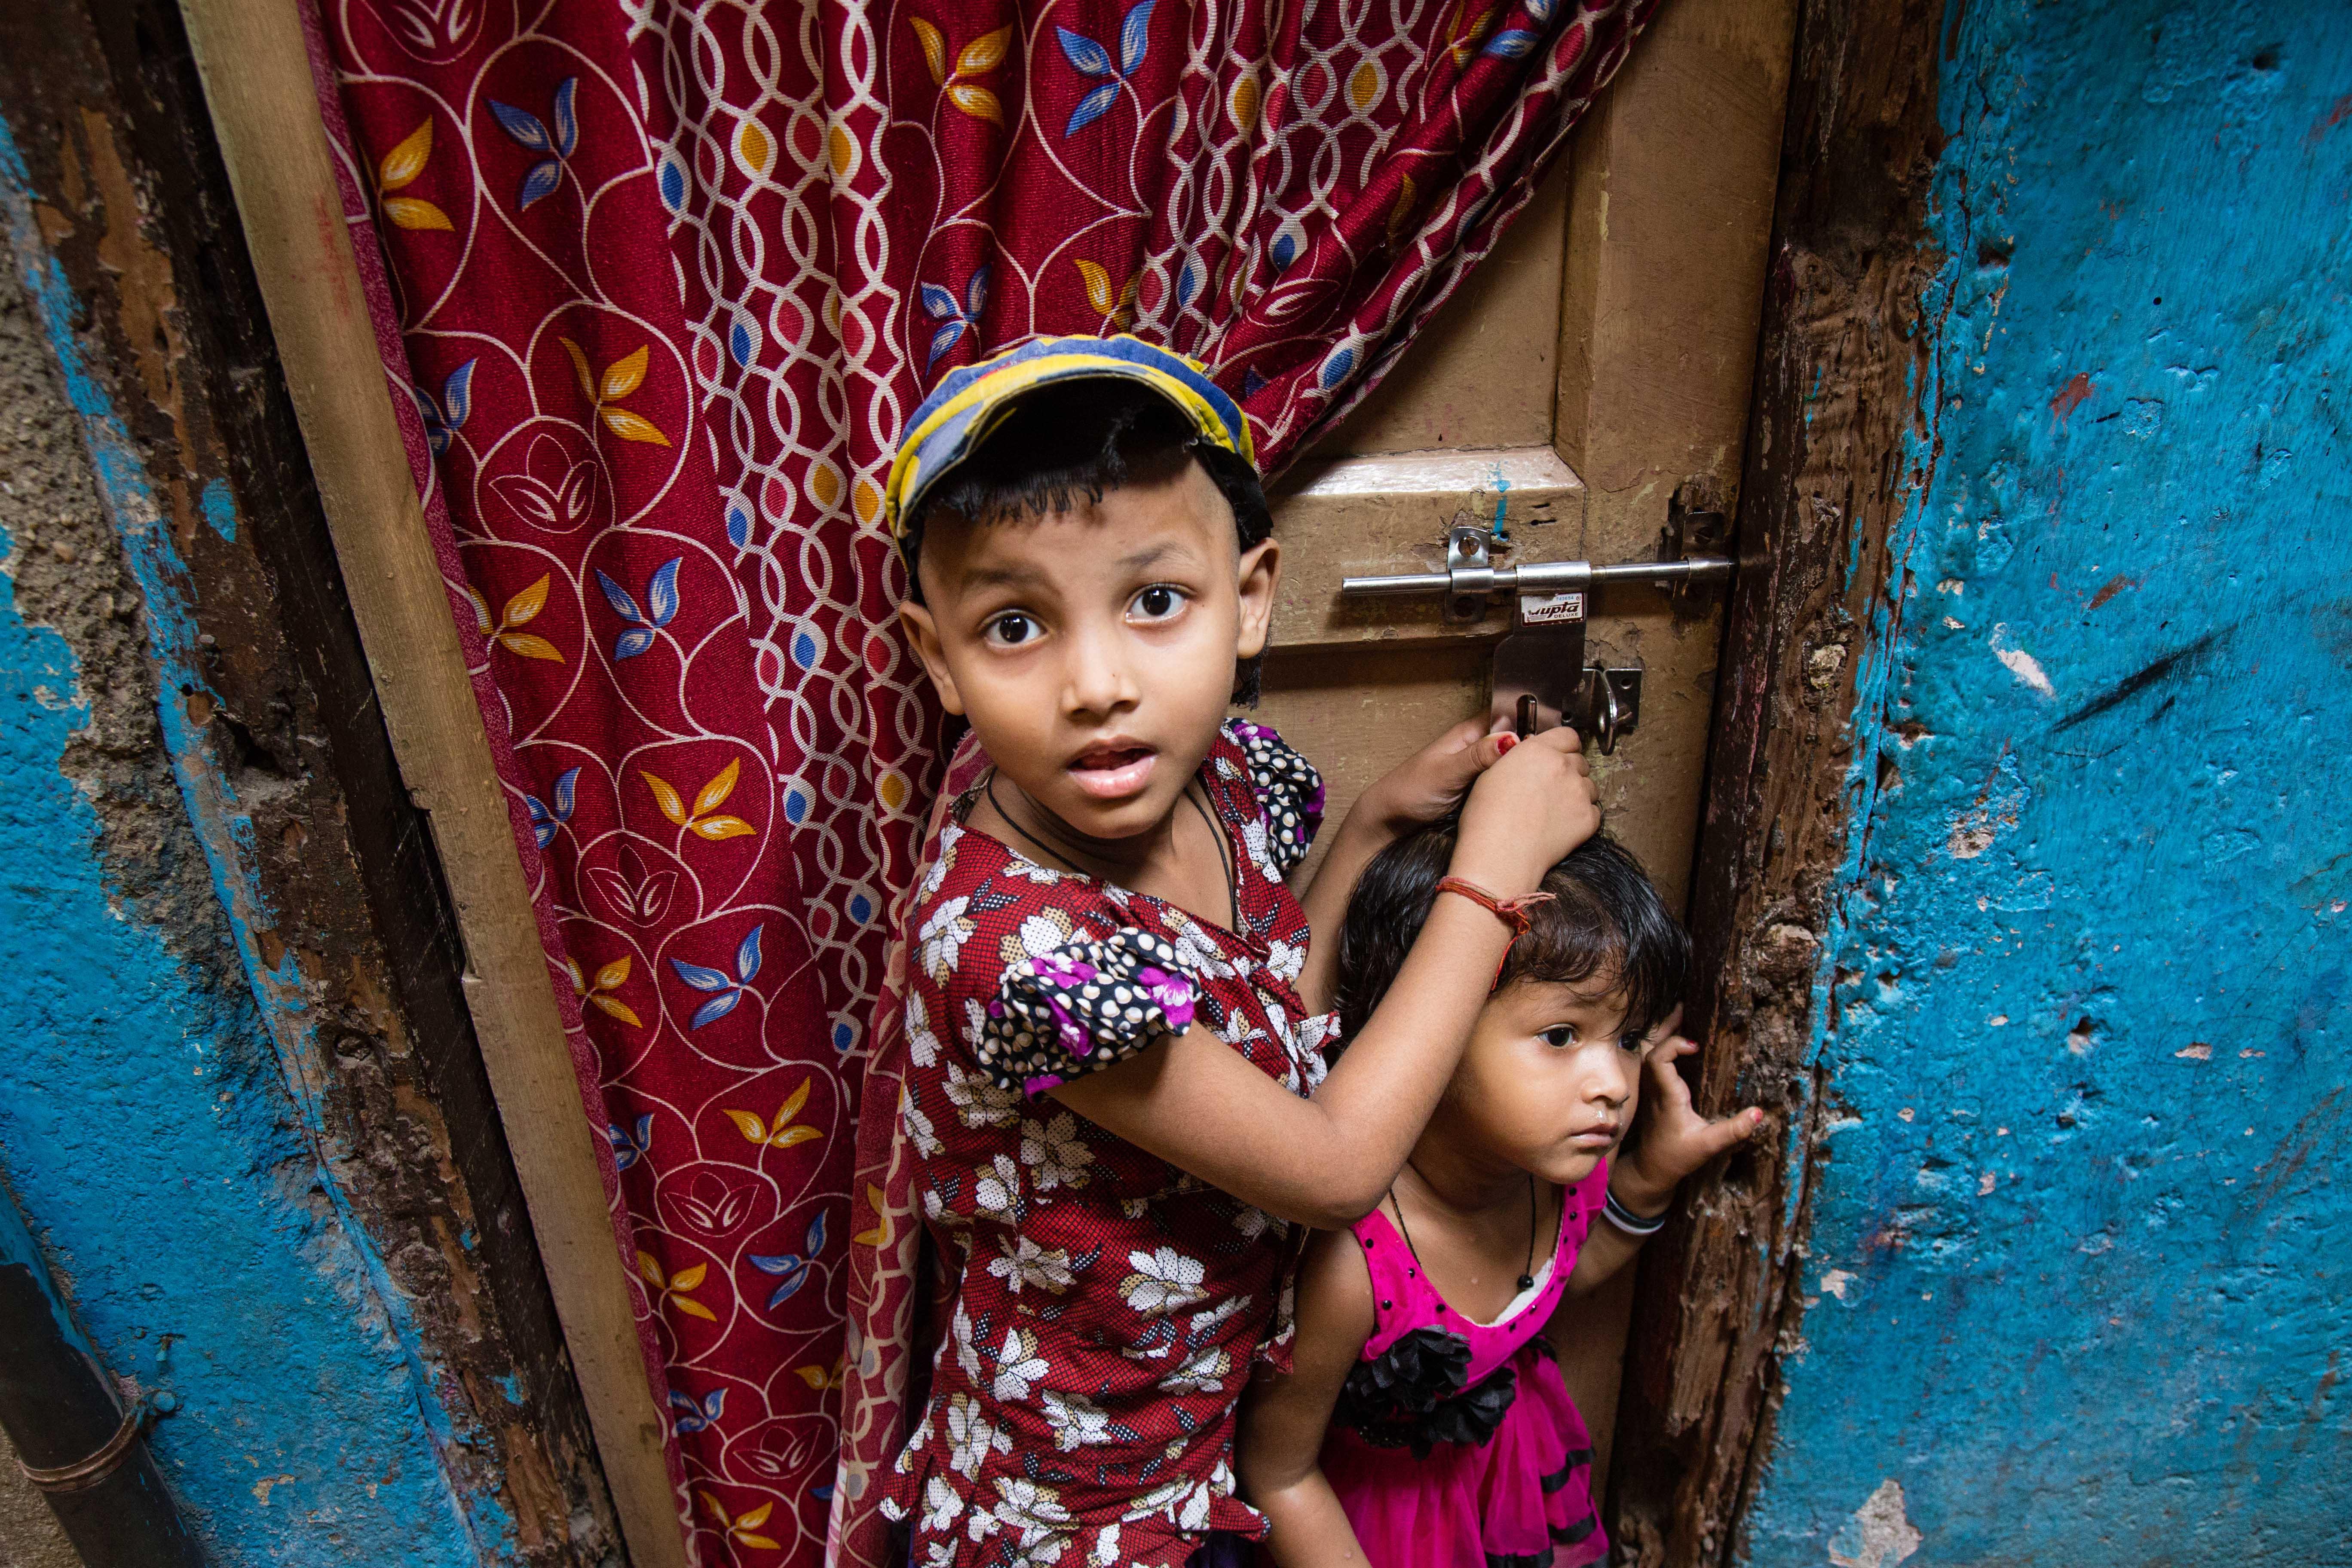 Mumbai (Bombay), sourires de bidonvilles. Partie II